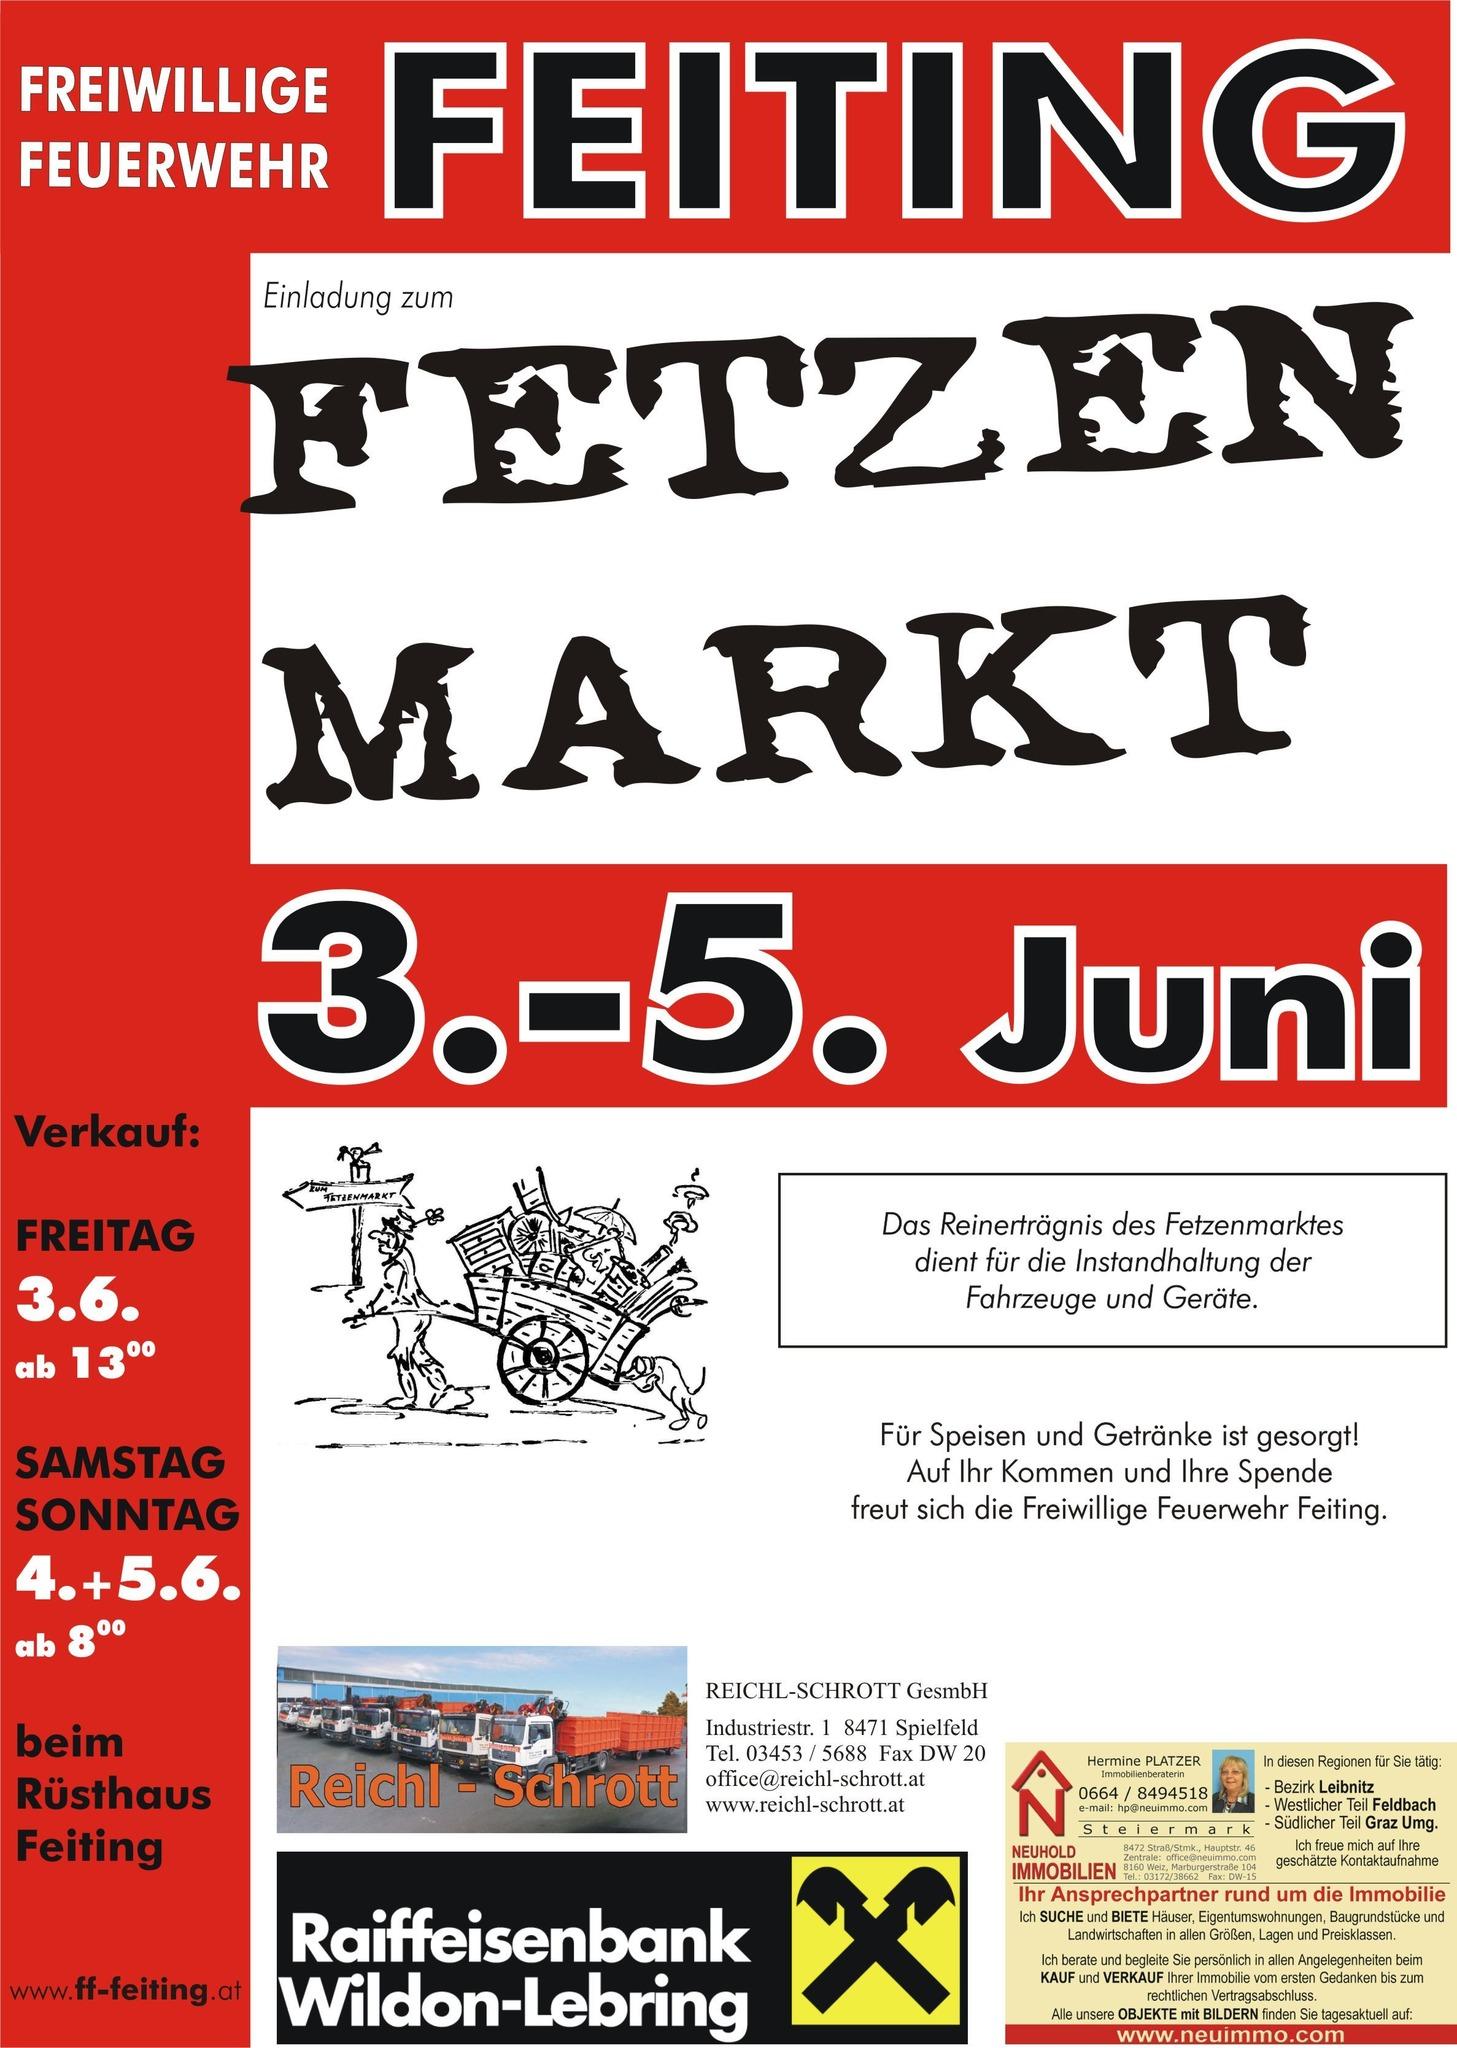 Fetzenmarkt in Feiting - Leibnitz